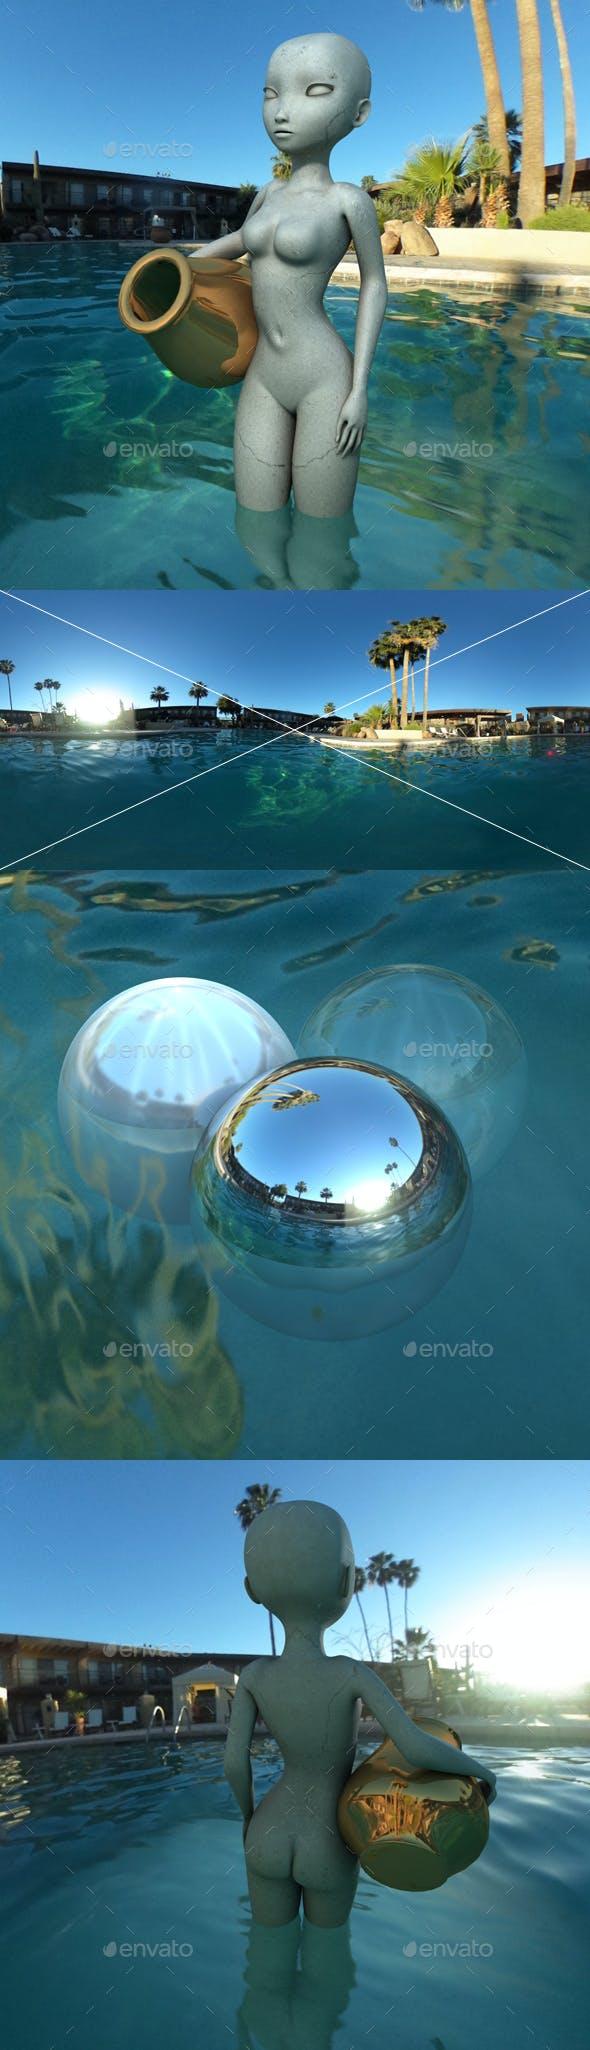 Early Morning Pool HDRI - 3DOcean Item for Sale